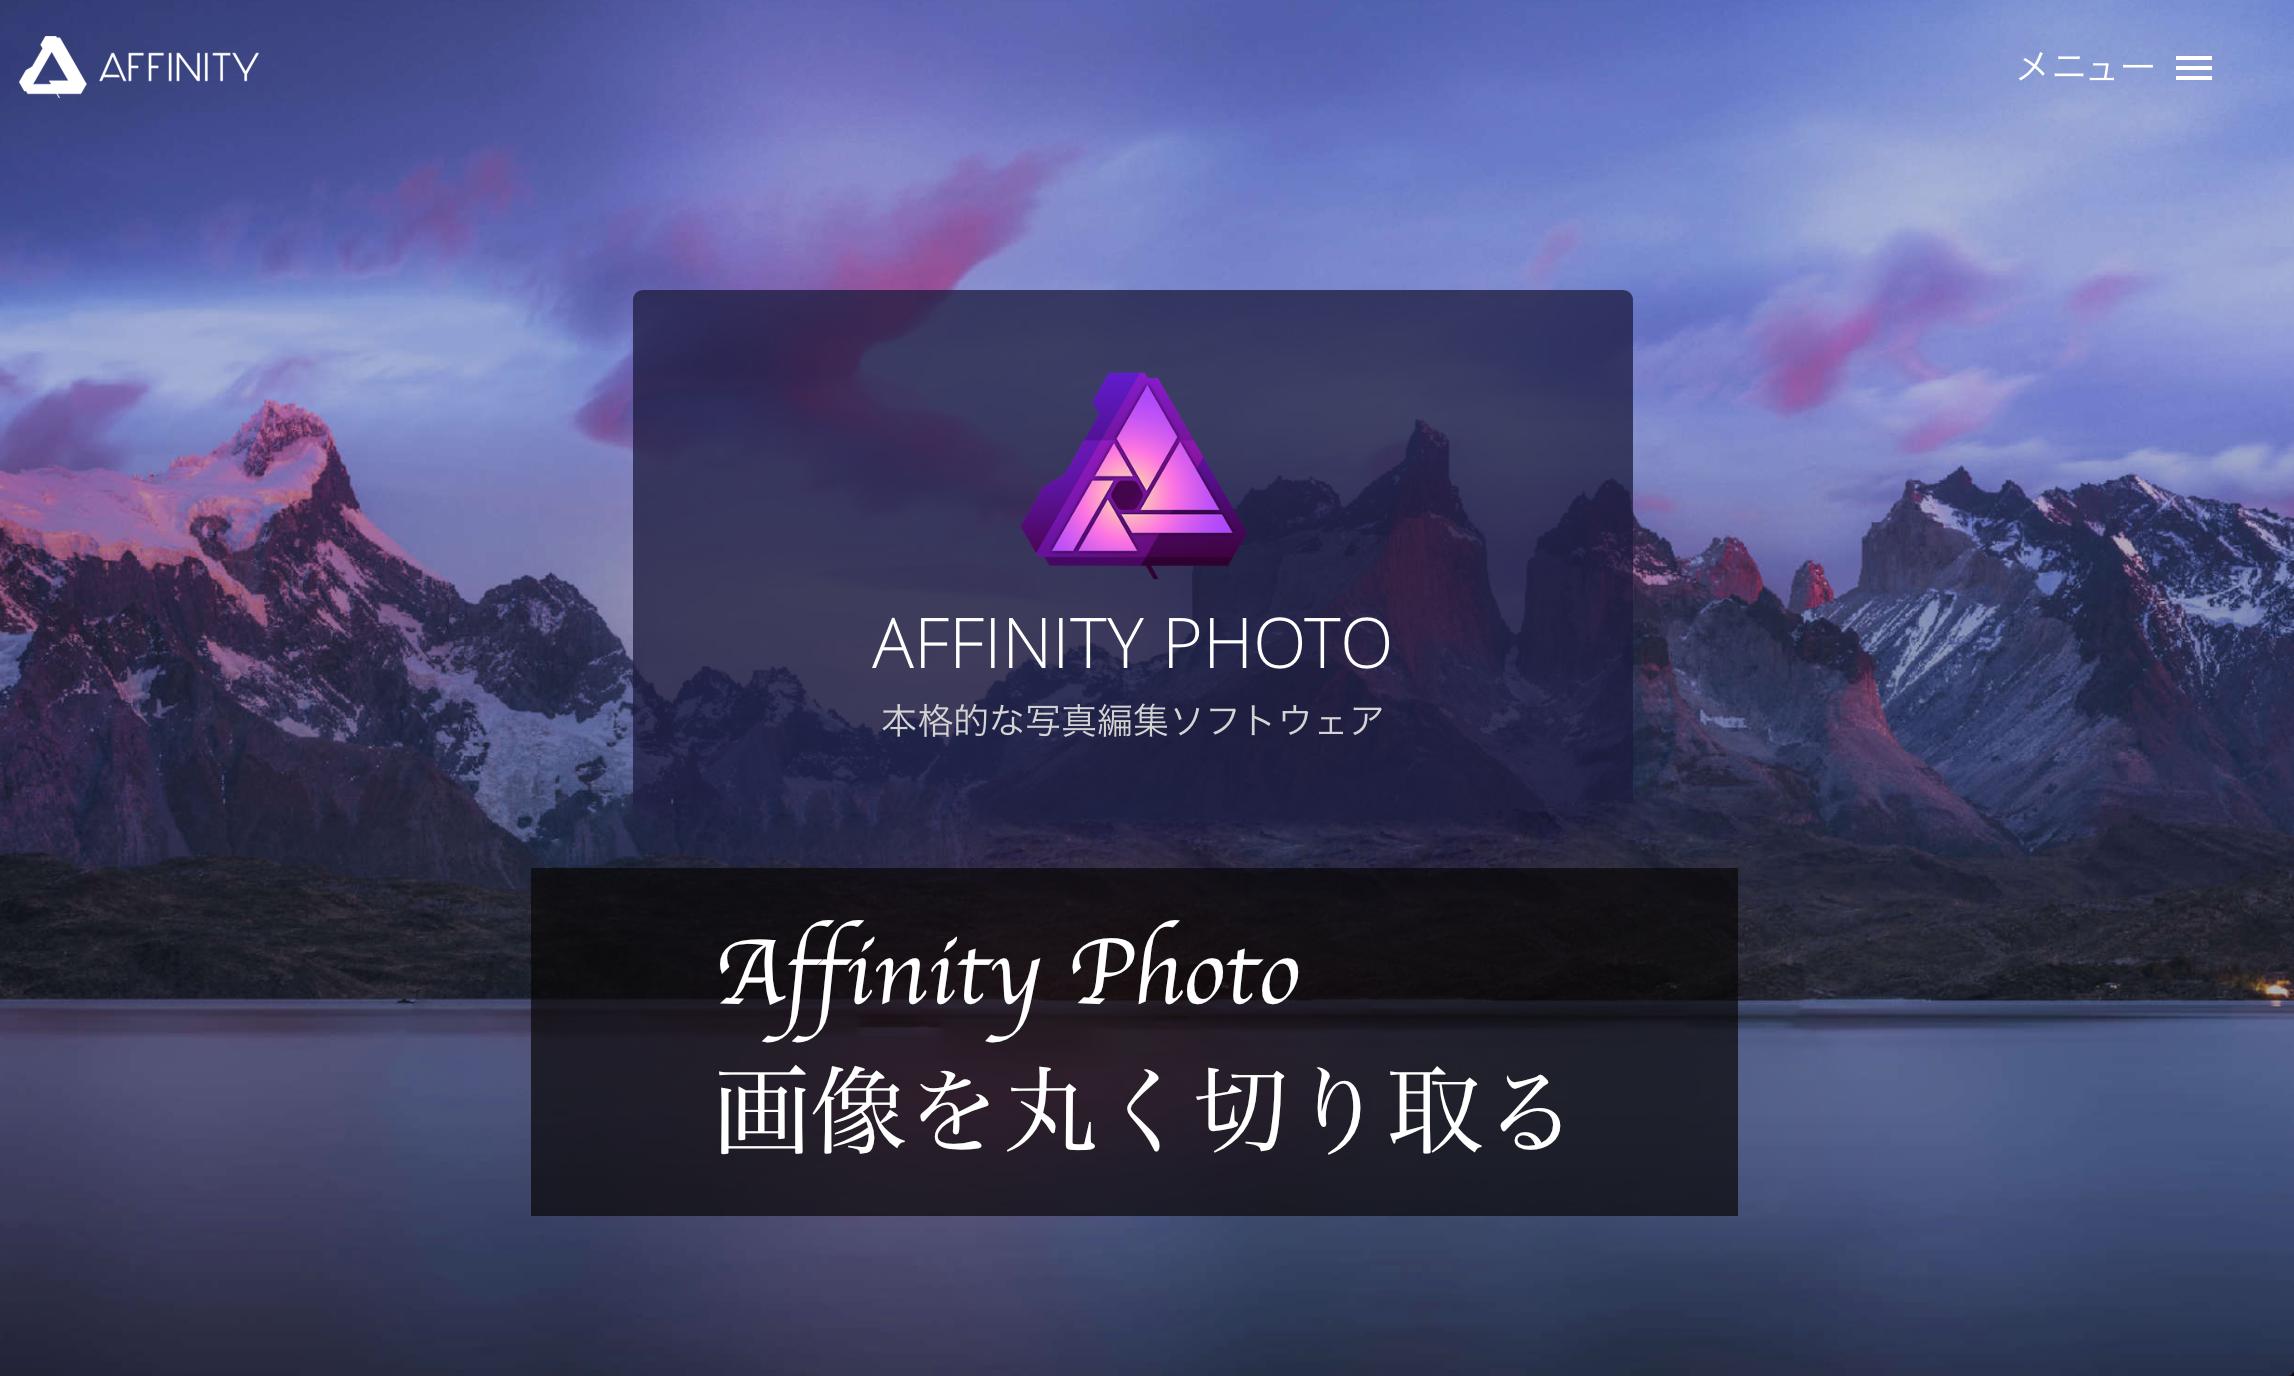 Affinity Photo 画像を丸く切り取る